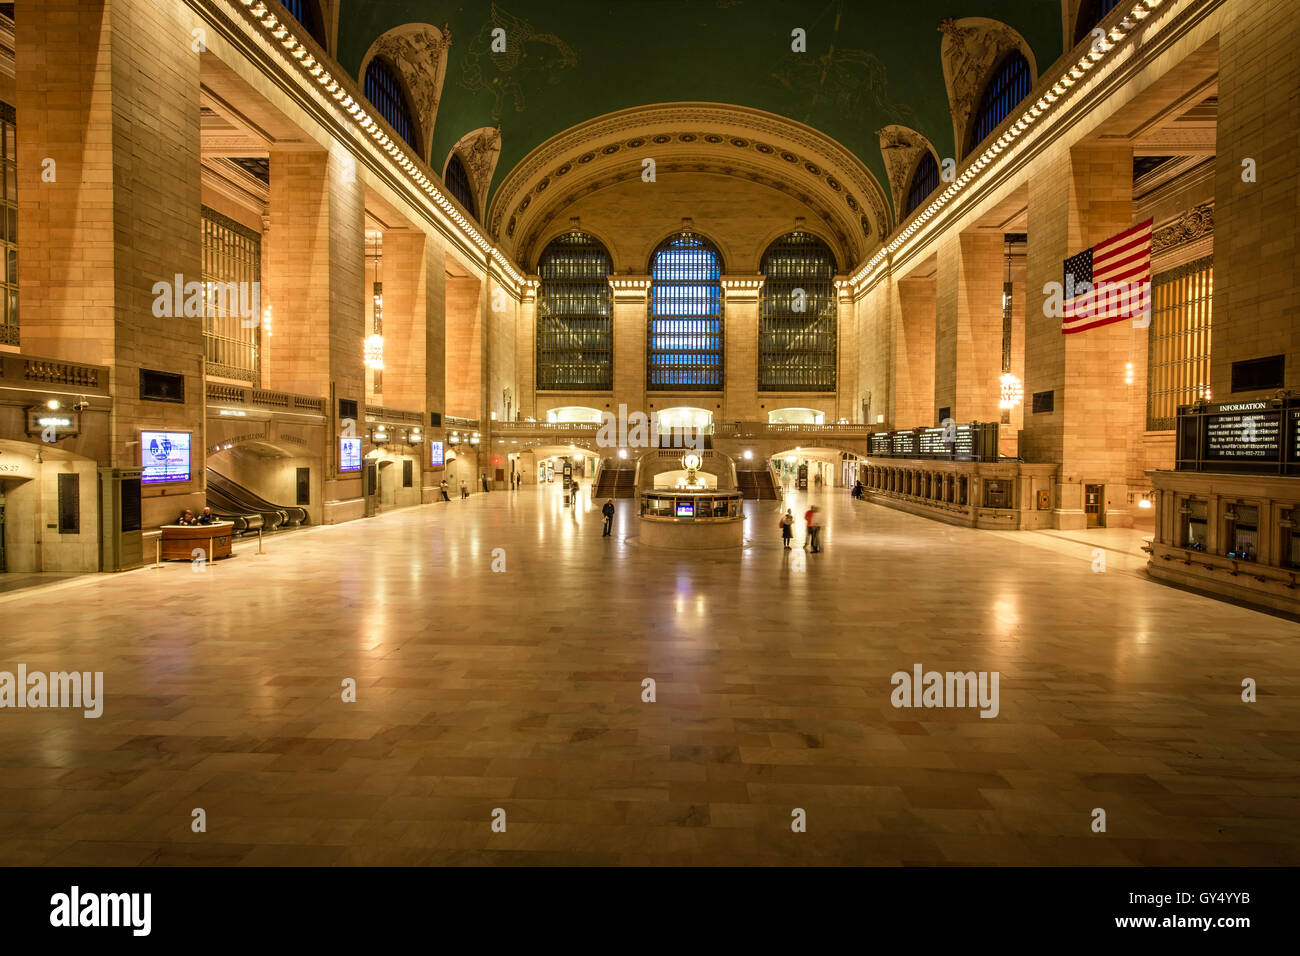 Grand Central Terminal Photo Stock